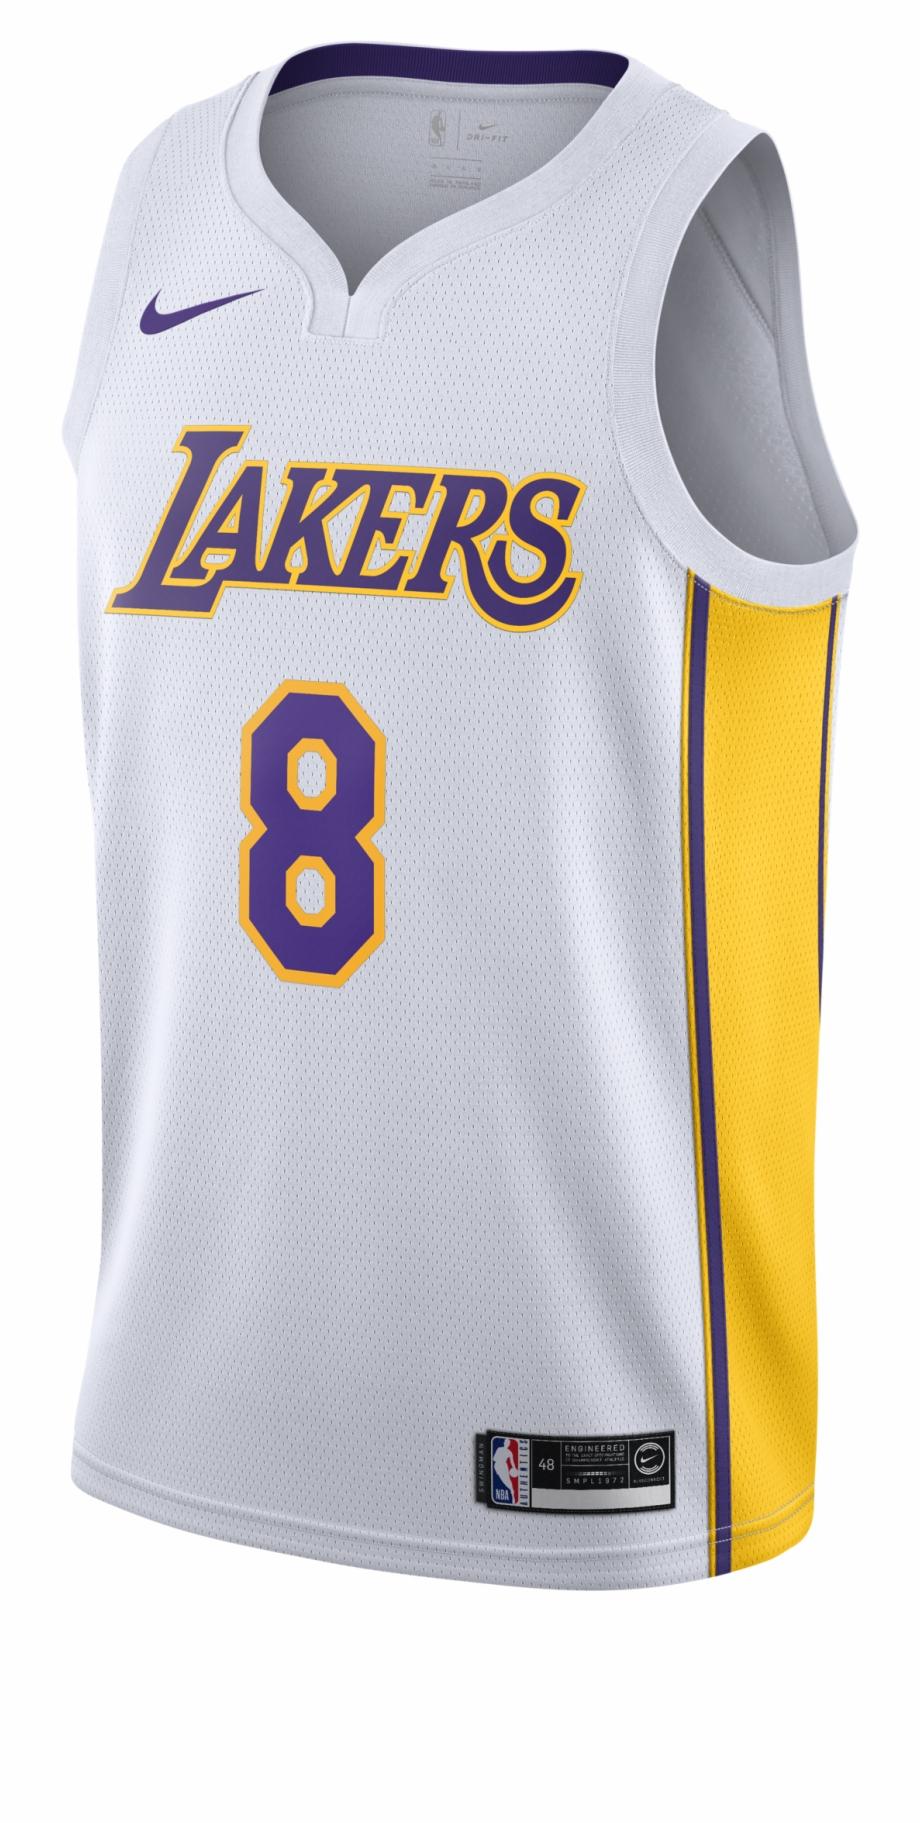 Nike Nba Los Angeles Lakers Kobe Bryant Swingman Home Lance Stephenson Jersey Lakers Transparent Png Download 1151432 Vippng